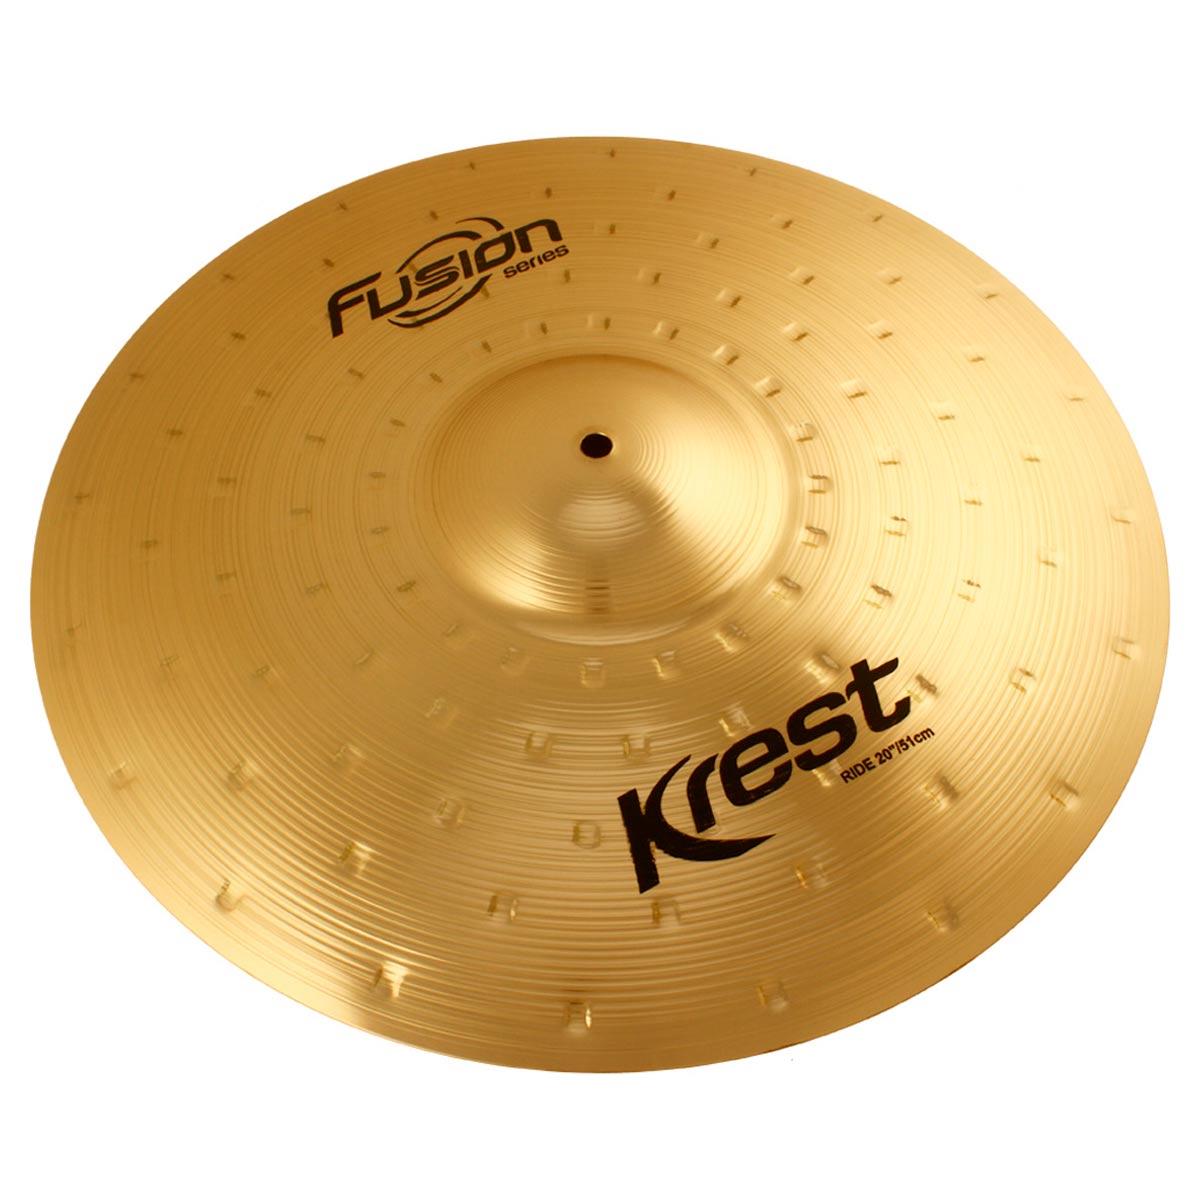 Prato Ride Fusion Series 20' Krest Cymbals (Condução)